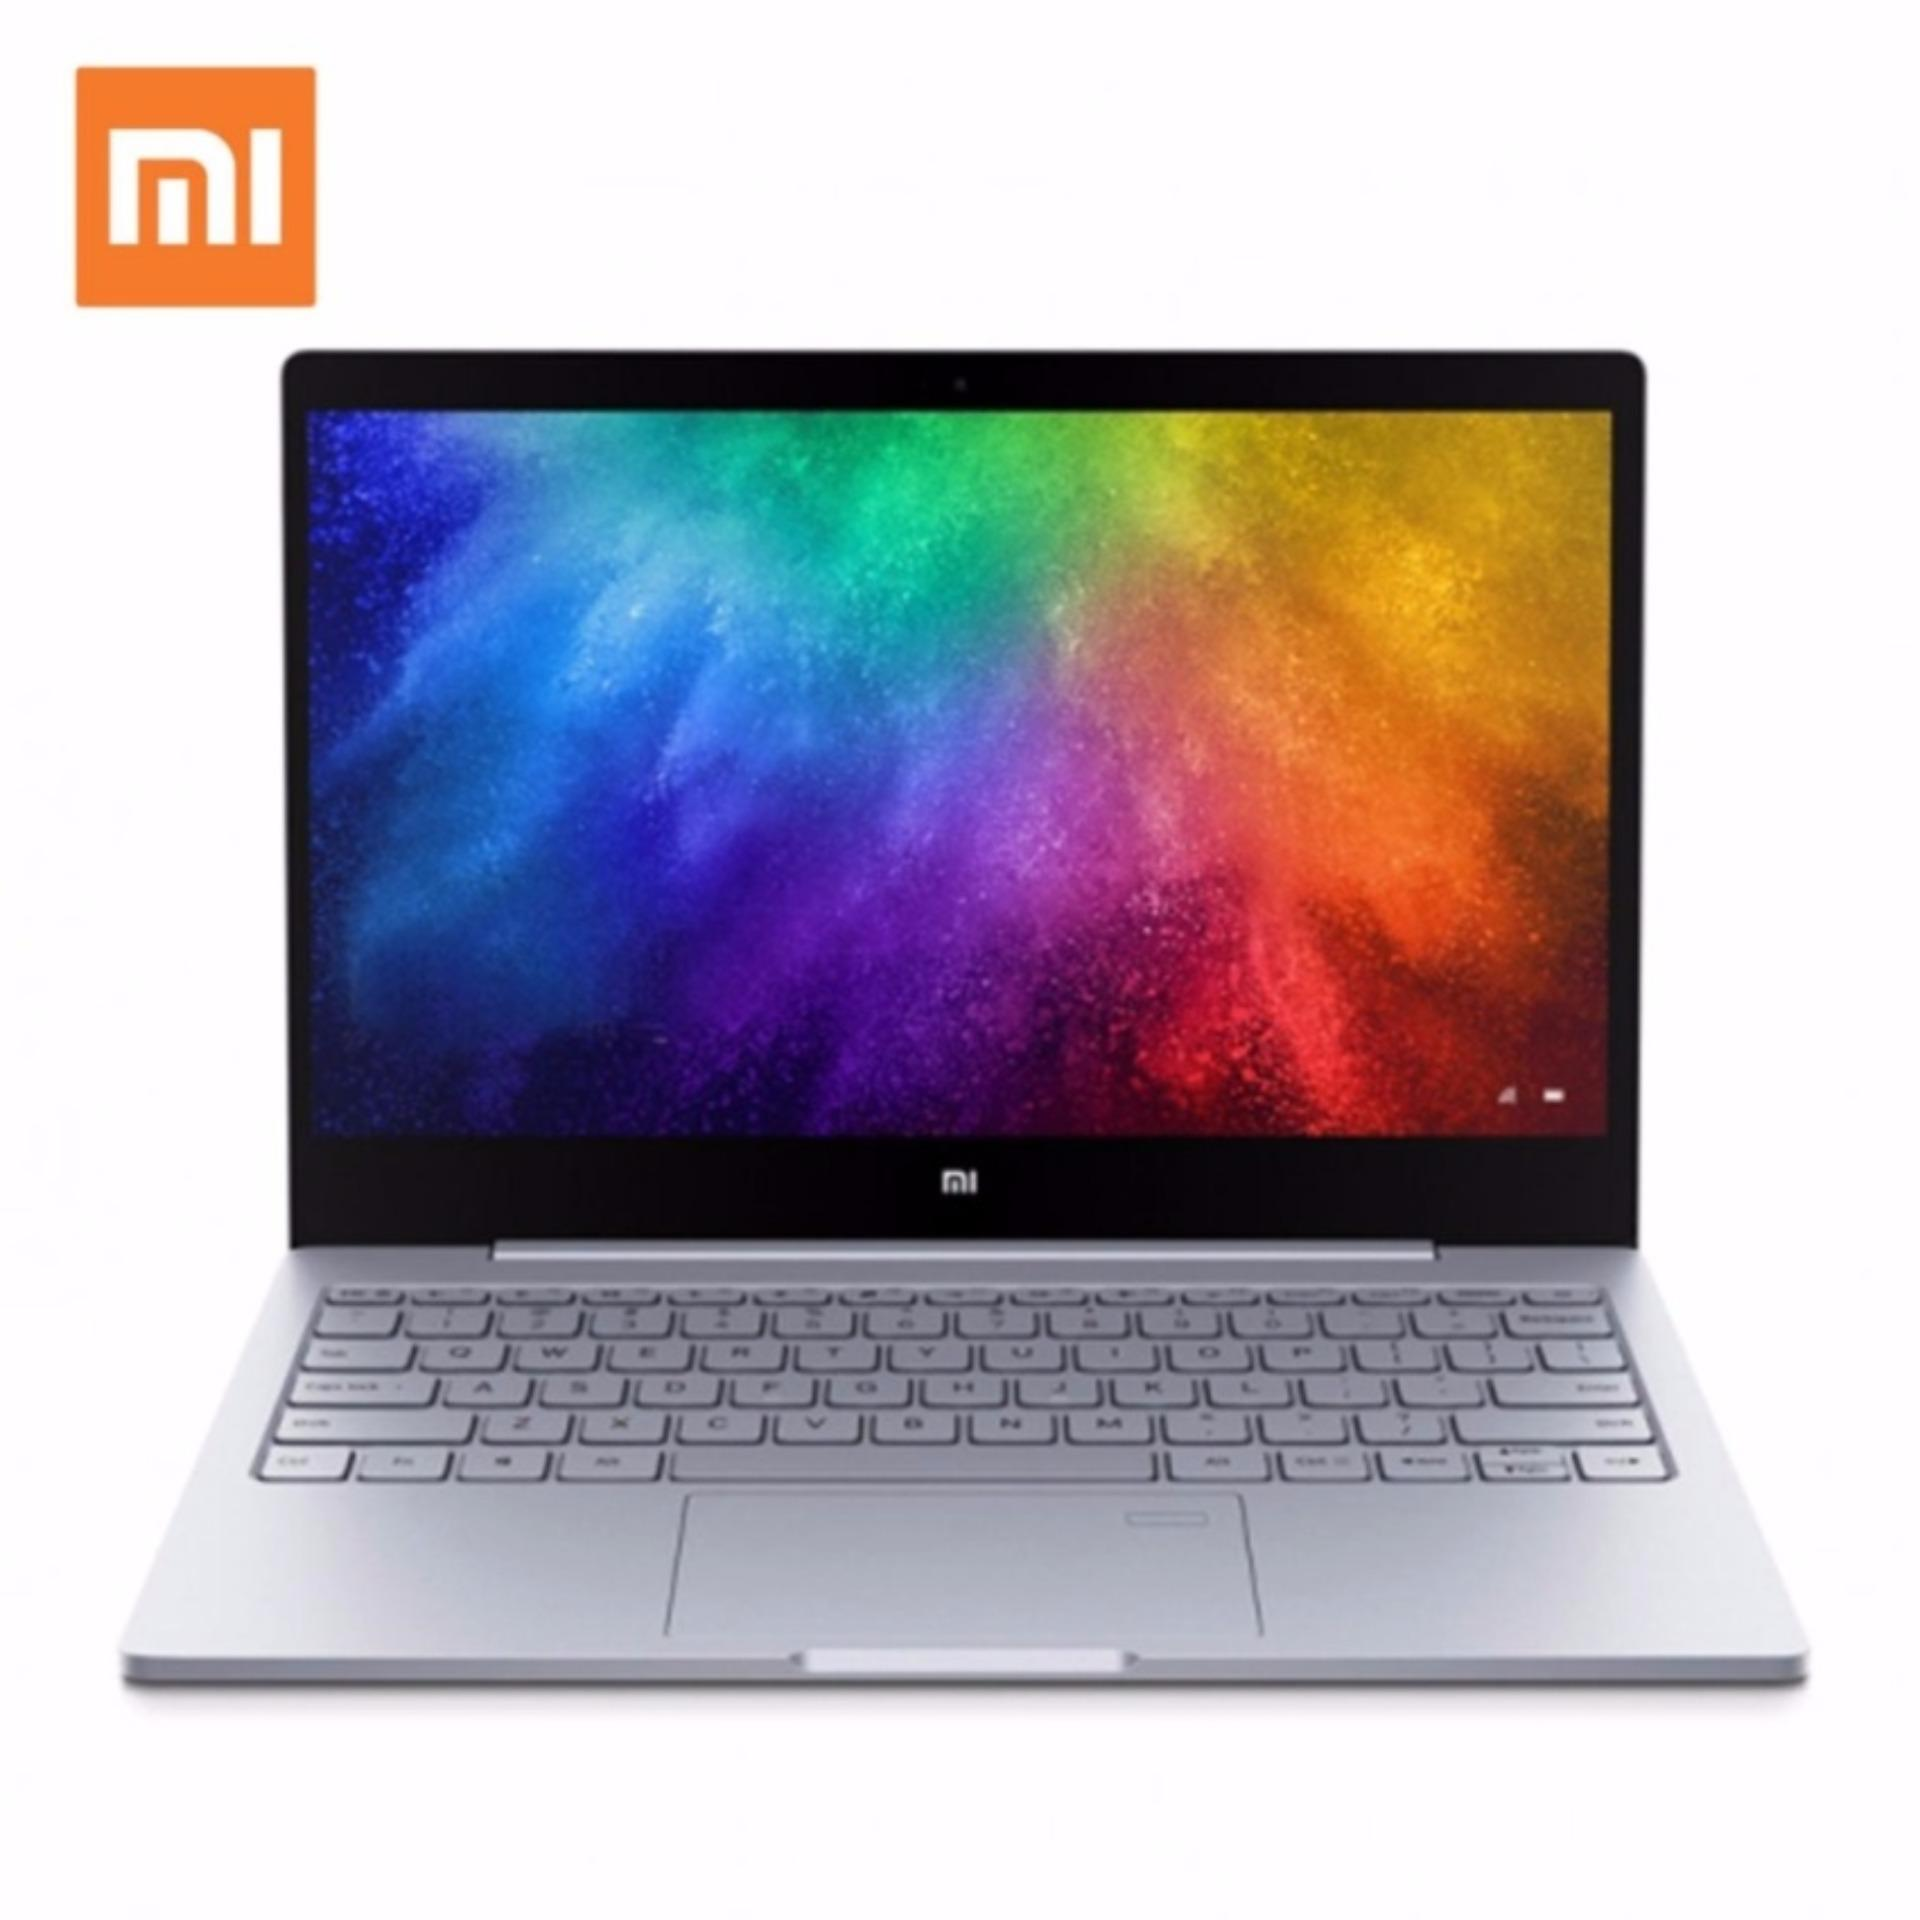 Xiaomi Mi Notebook Laptop Air 13.3 Inch Fingerprint i5-7200U Intel Core 8GB 256GB SSD Computer Silver (Export)